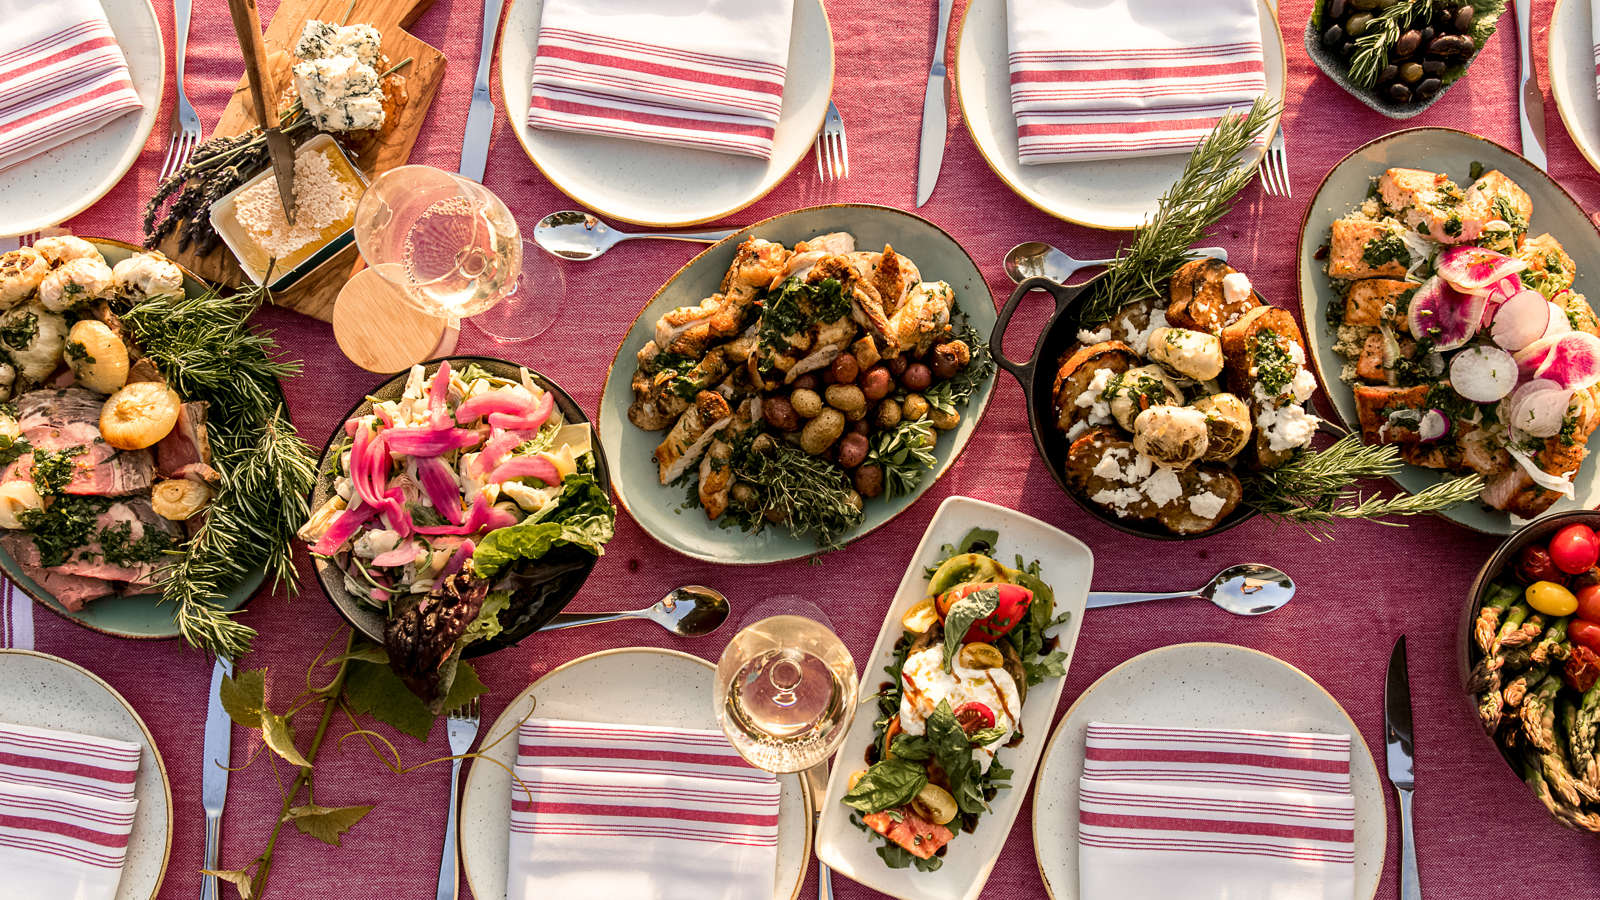 Carmel Valley Ranch_Dining_Food_menu family style_3810_KD